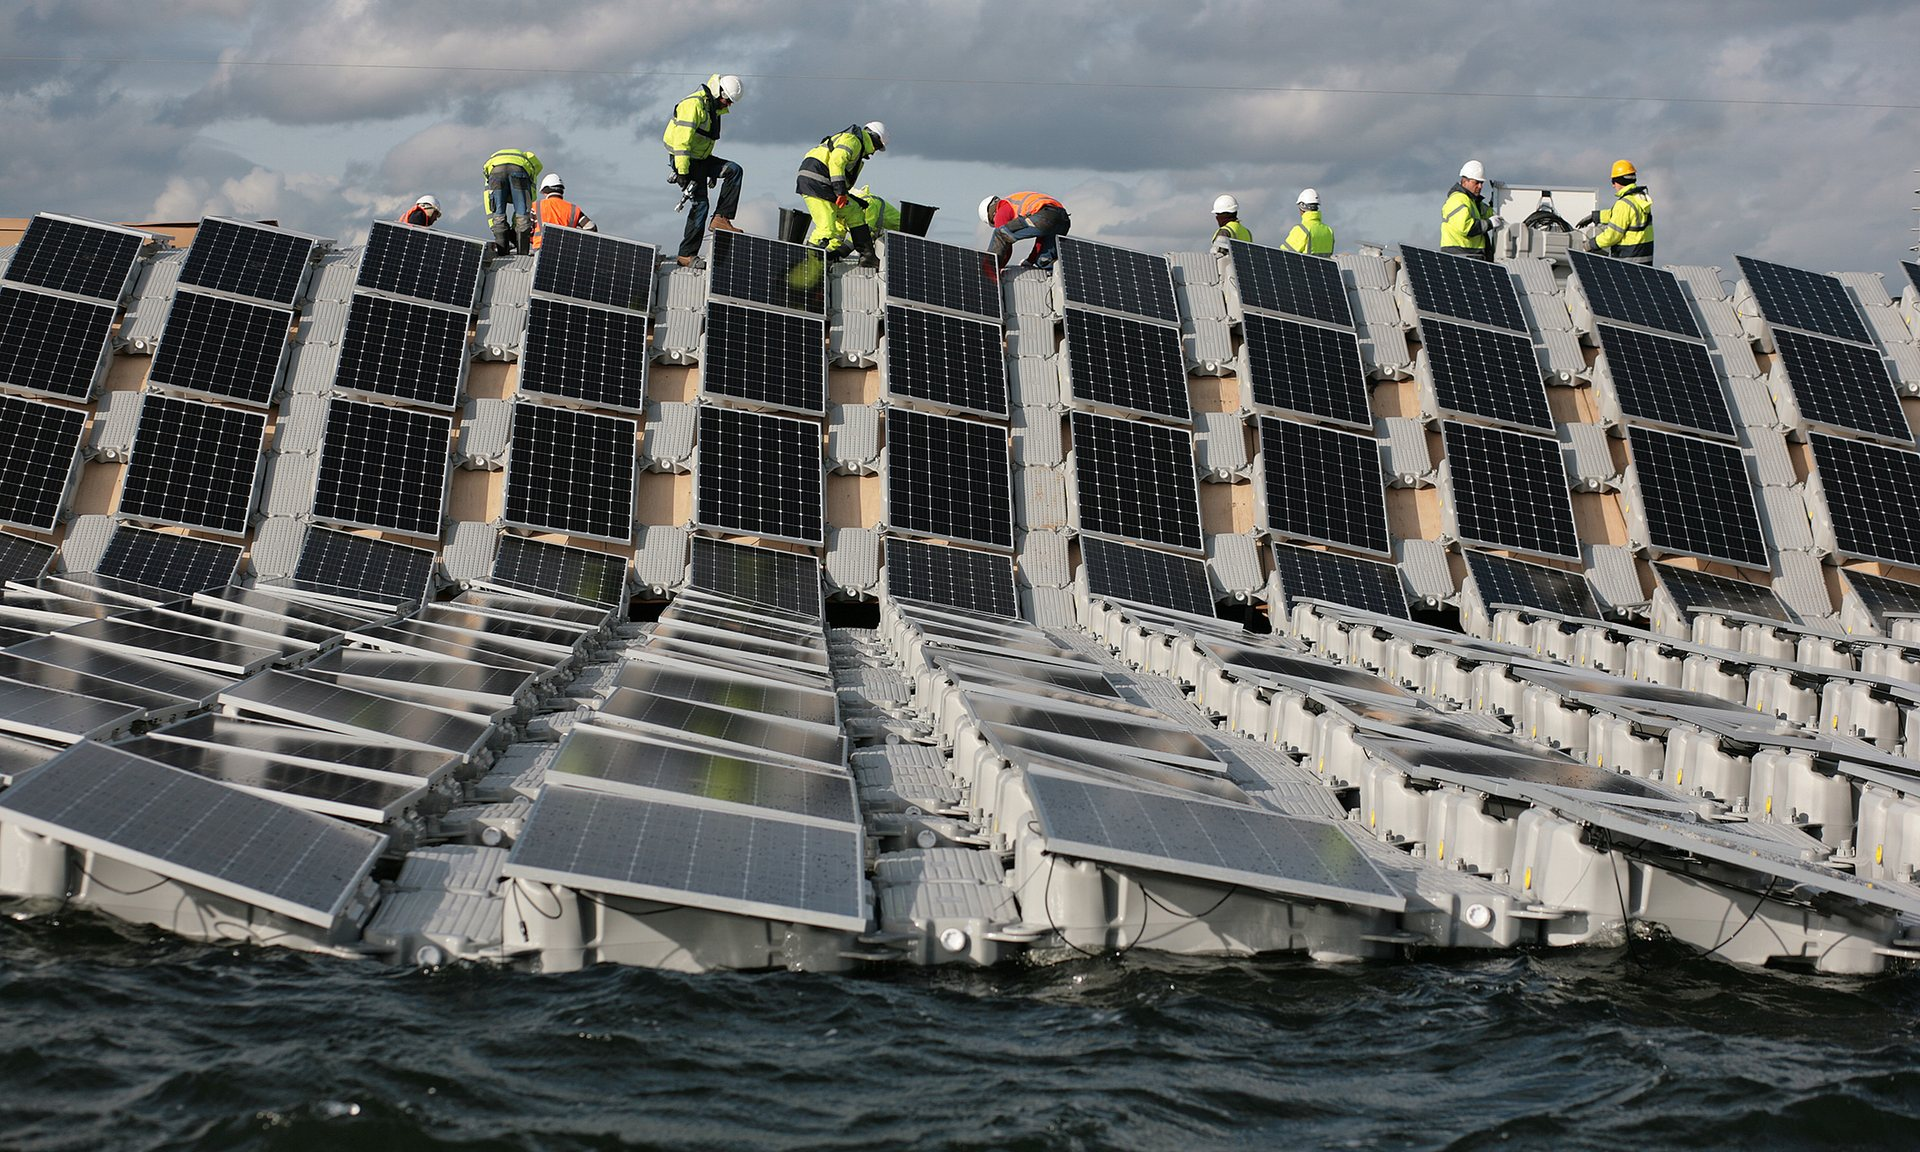 The world's largest floating solar farm near Heathrow will produce about 6.3MW